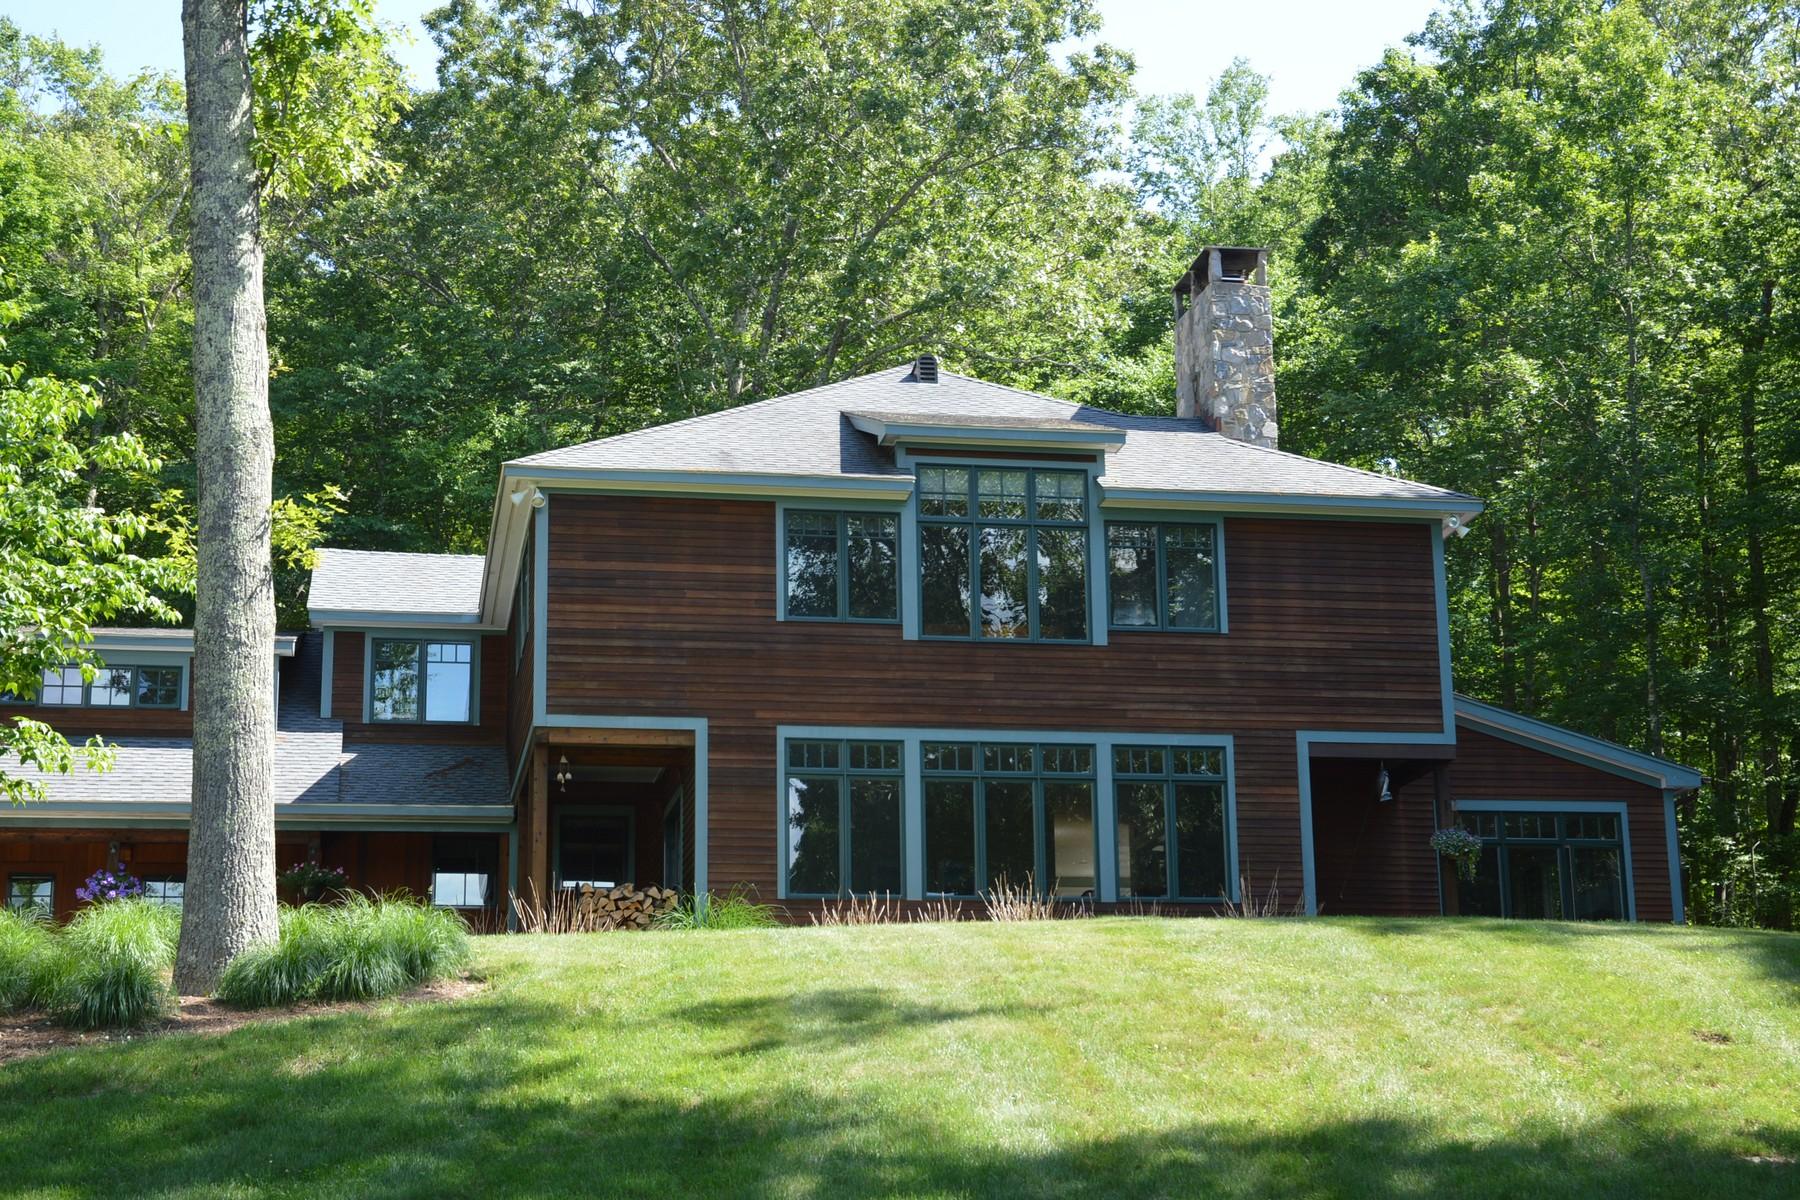 独户住宅 为 销售 在 Remarkable Custom Home 126 Essex St Deep River, 康涅狄格州, 06417 美国